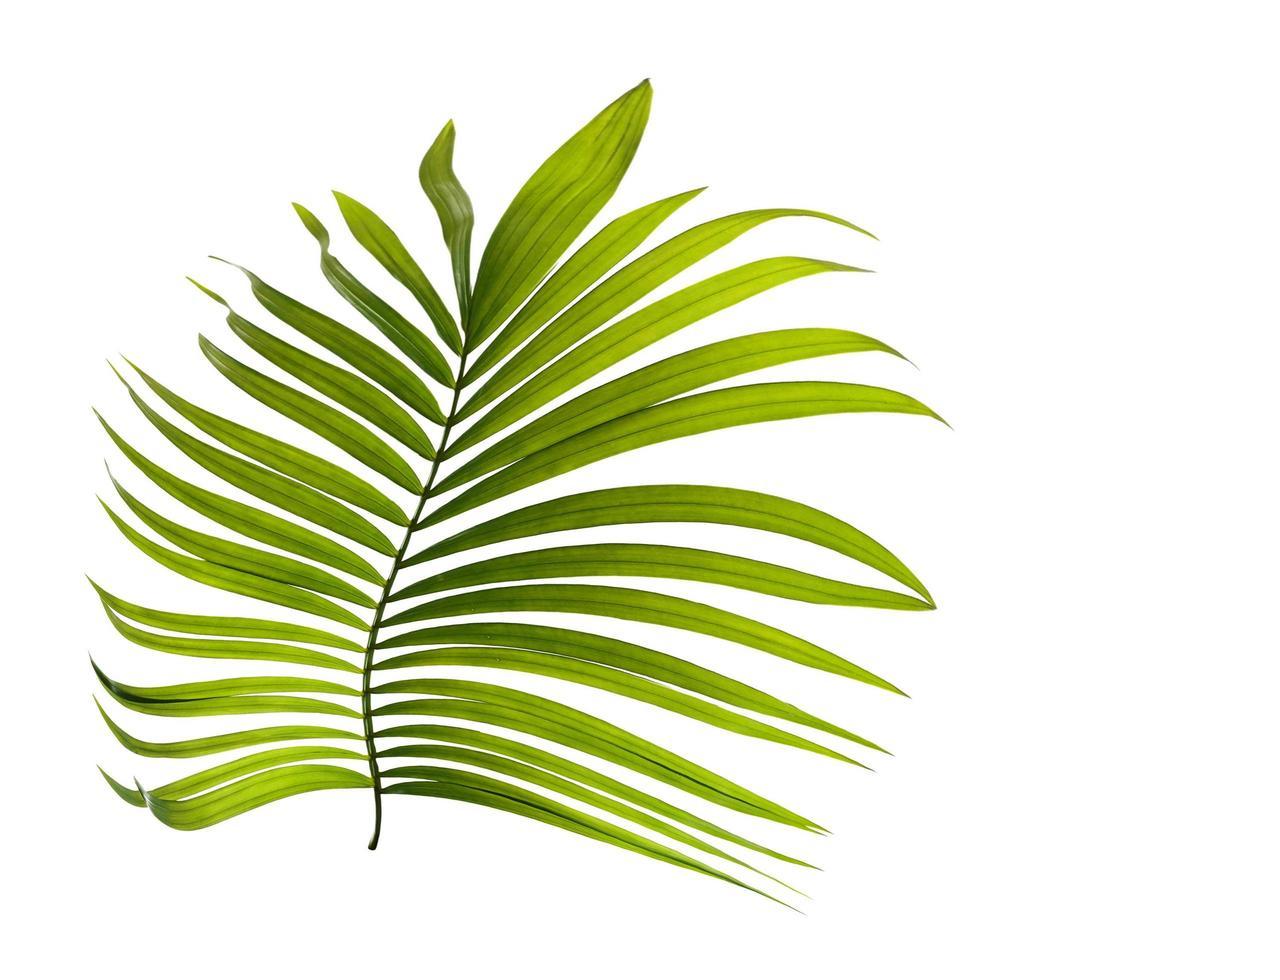 petite feuille tropicale verte photo